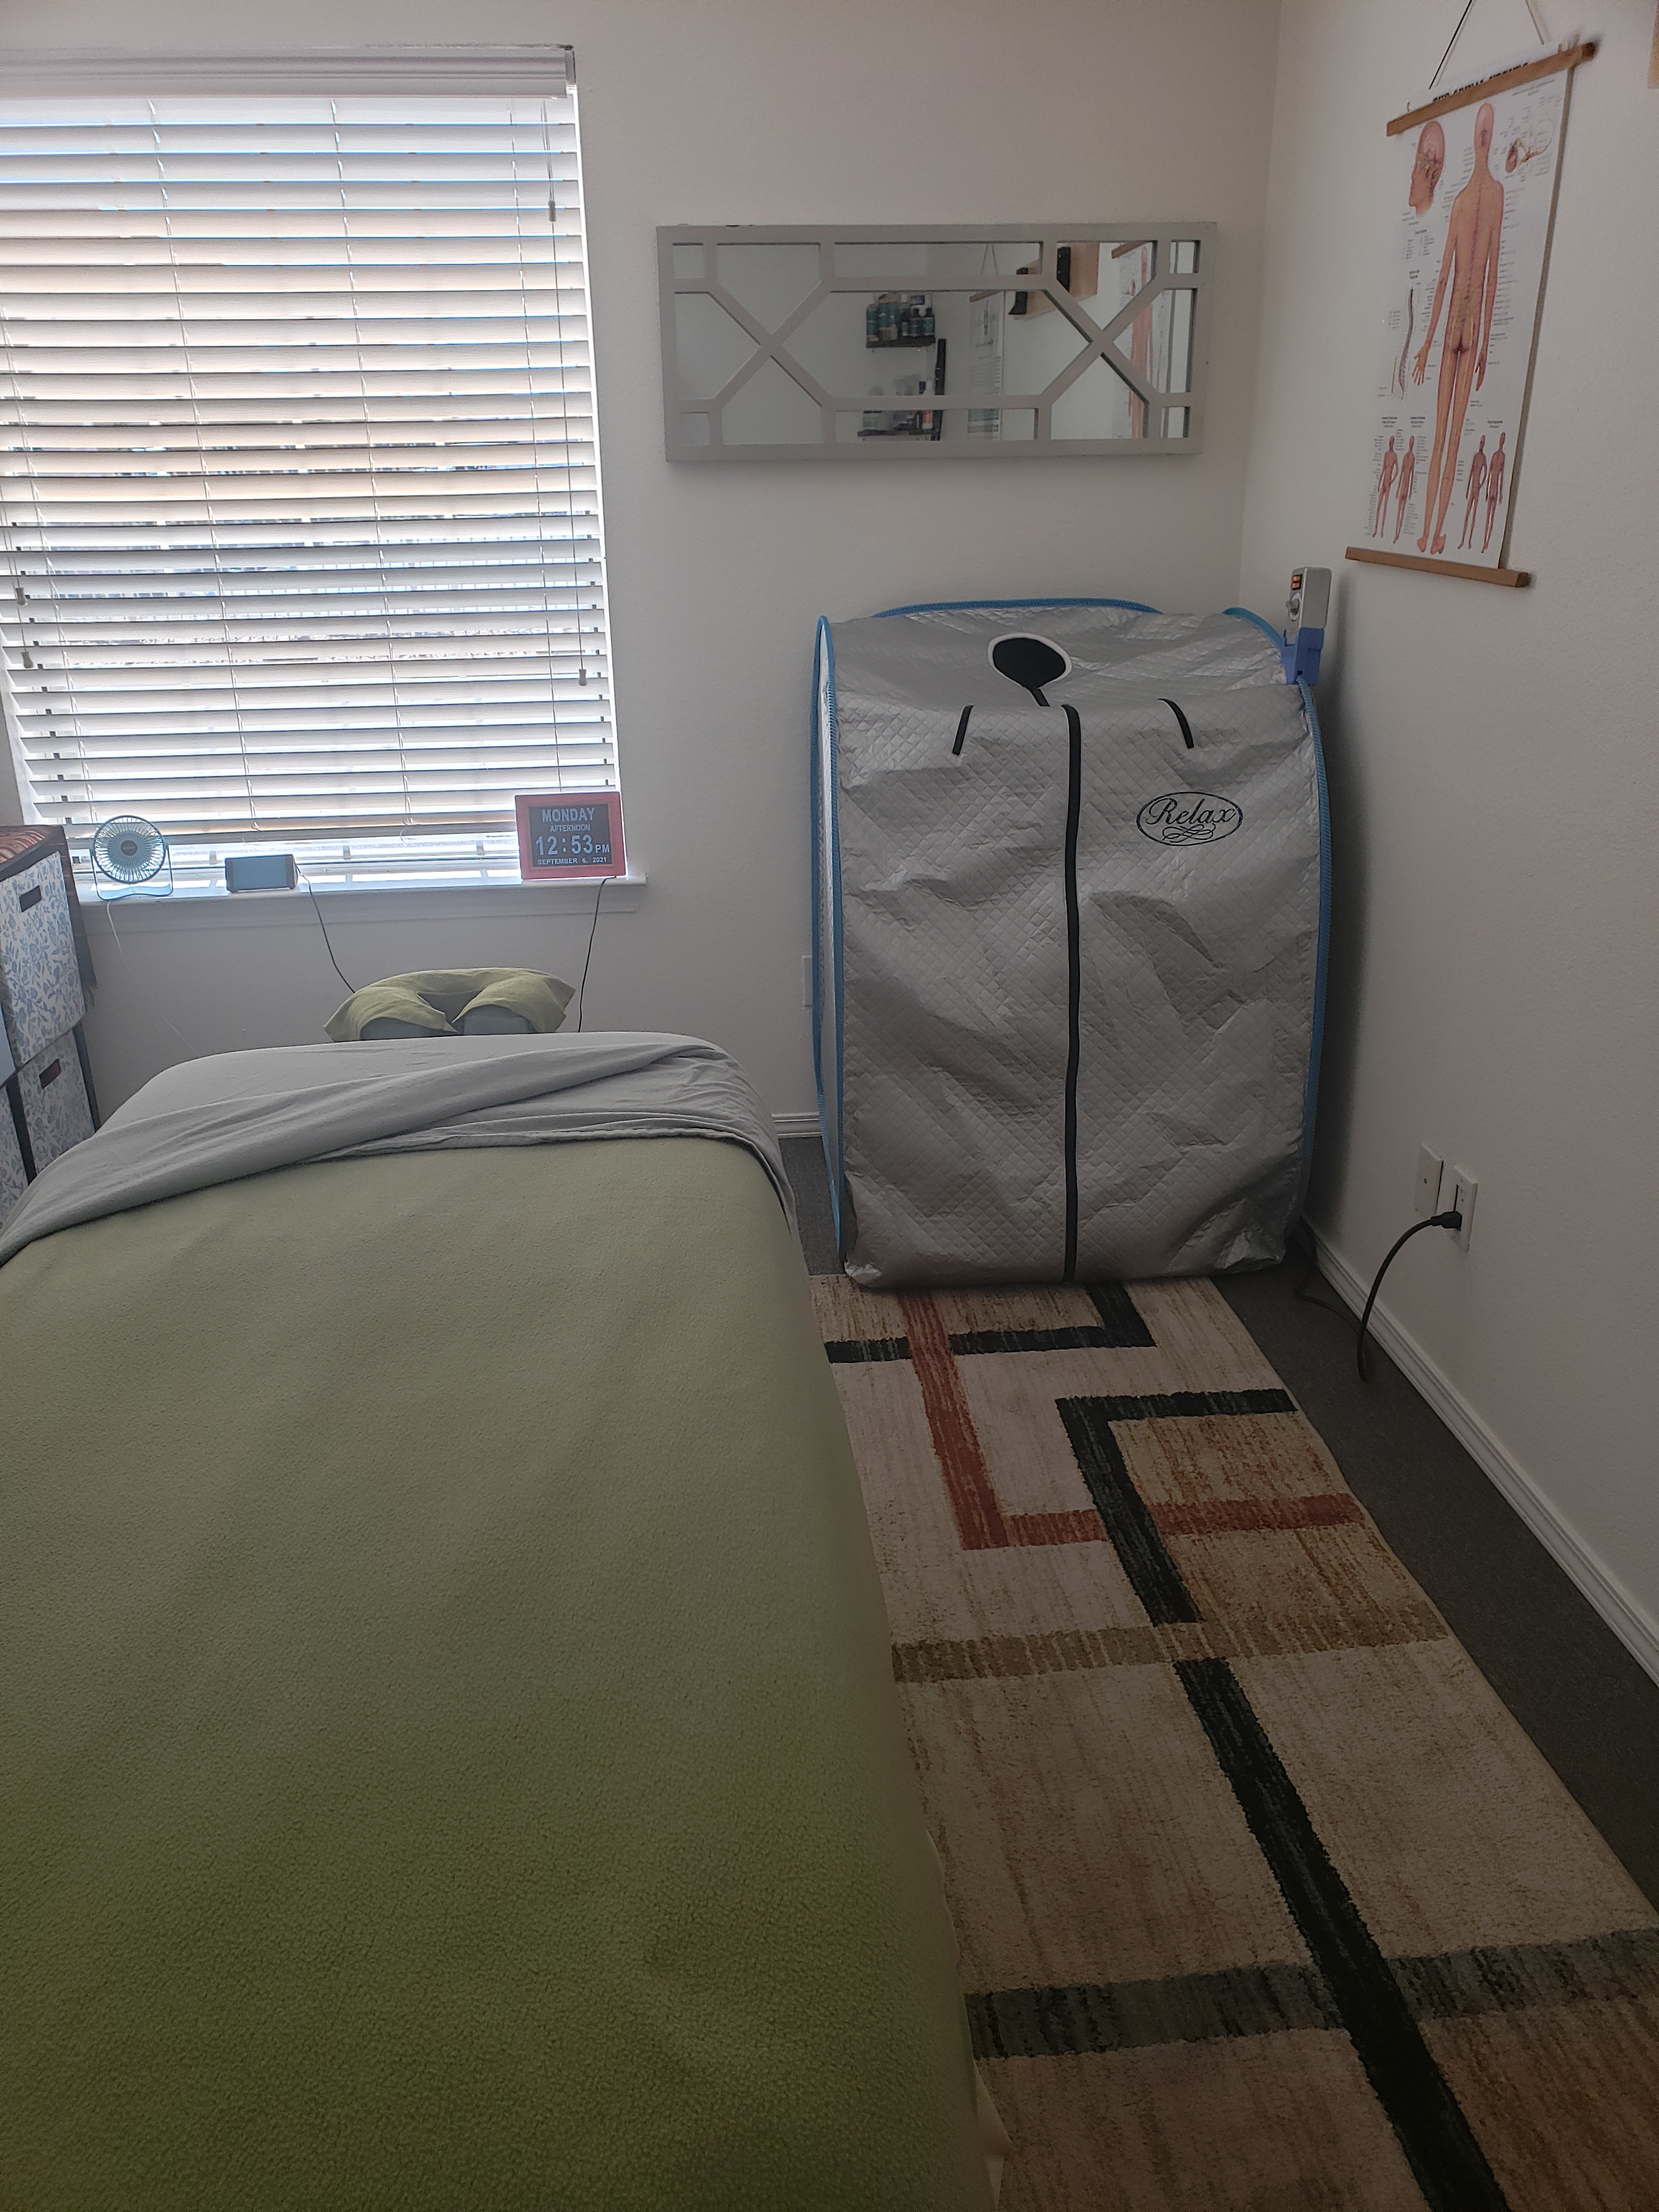 10min Infrared Sauna with 60min massage